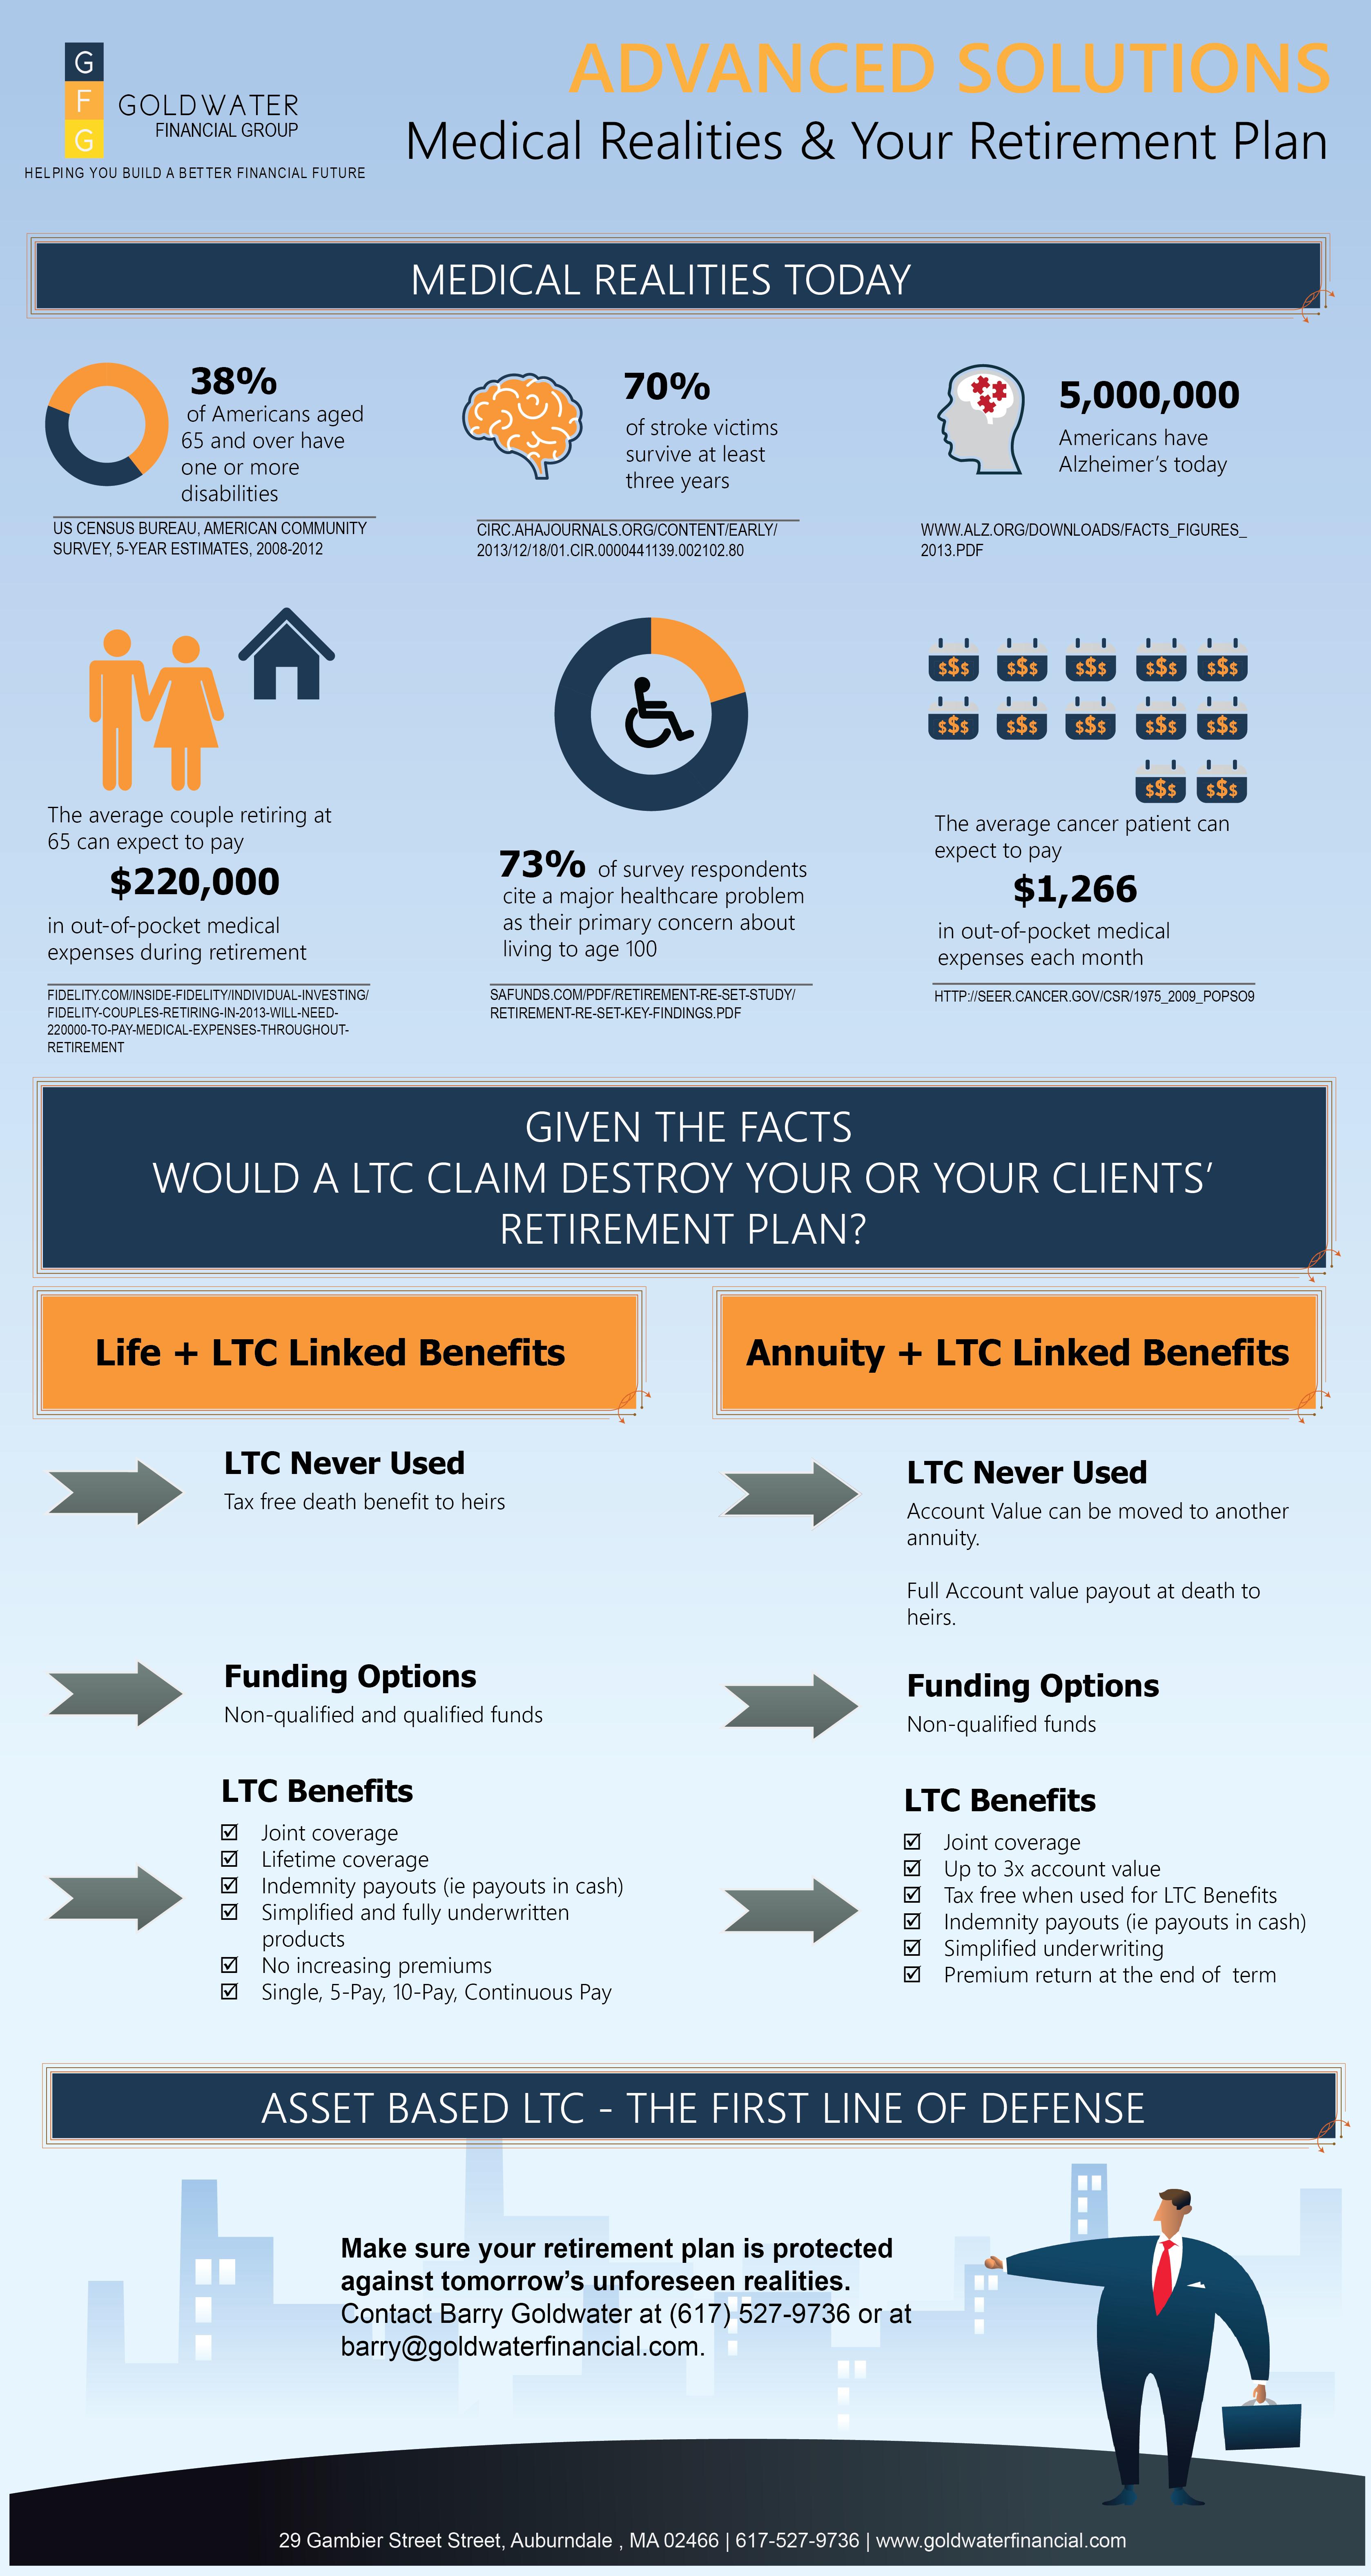 infographic-11-asset-based-ltc